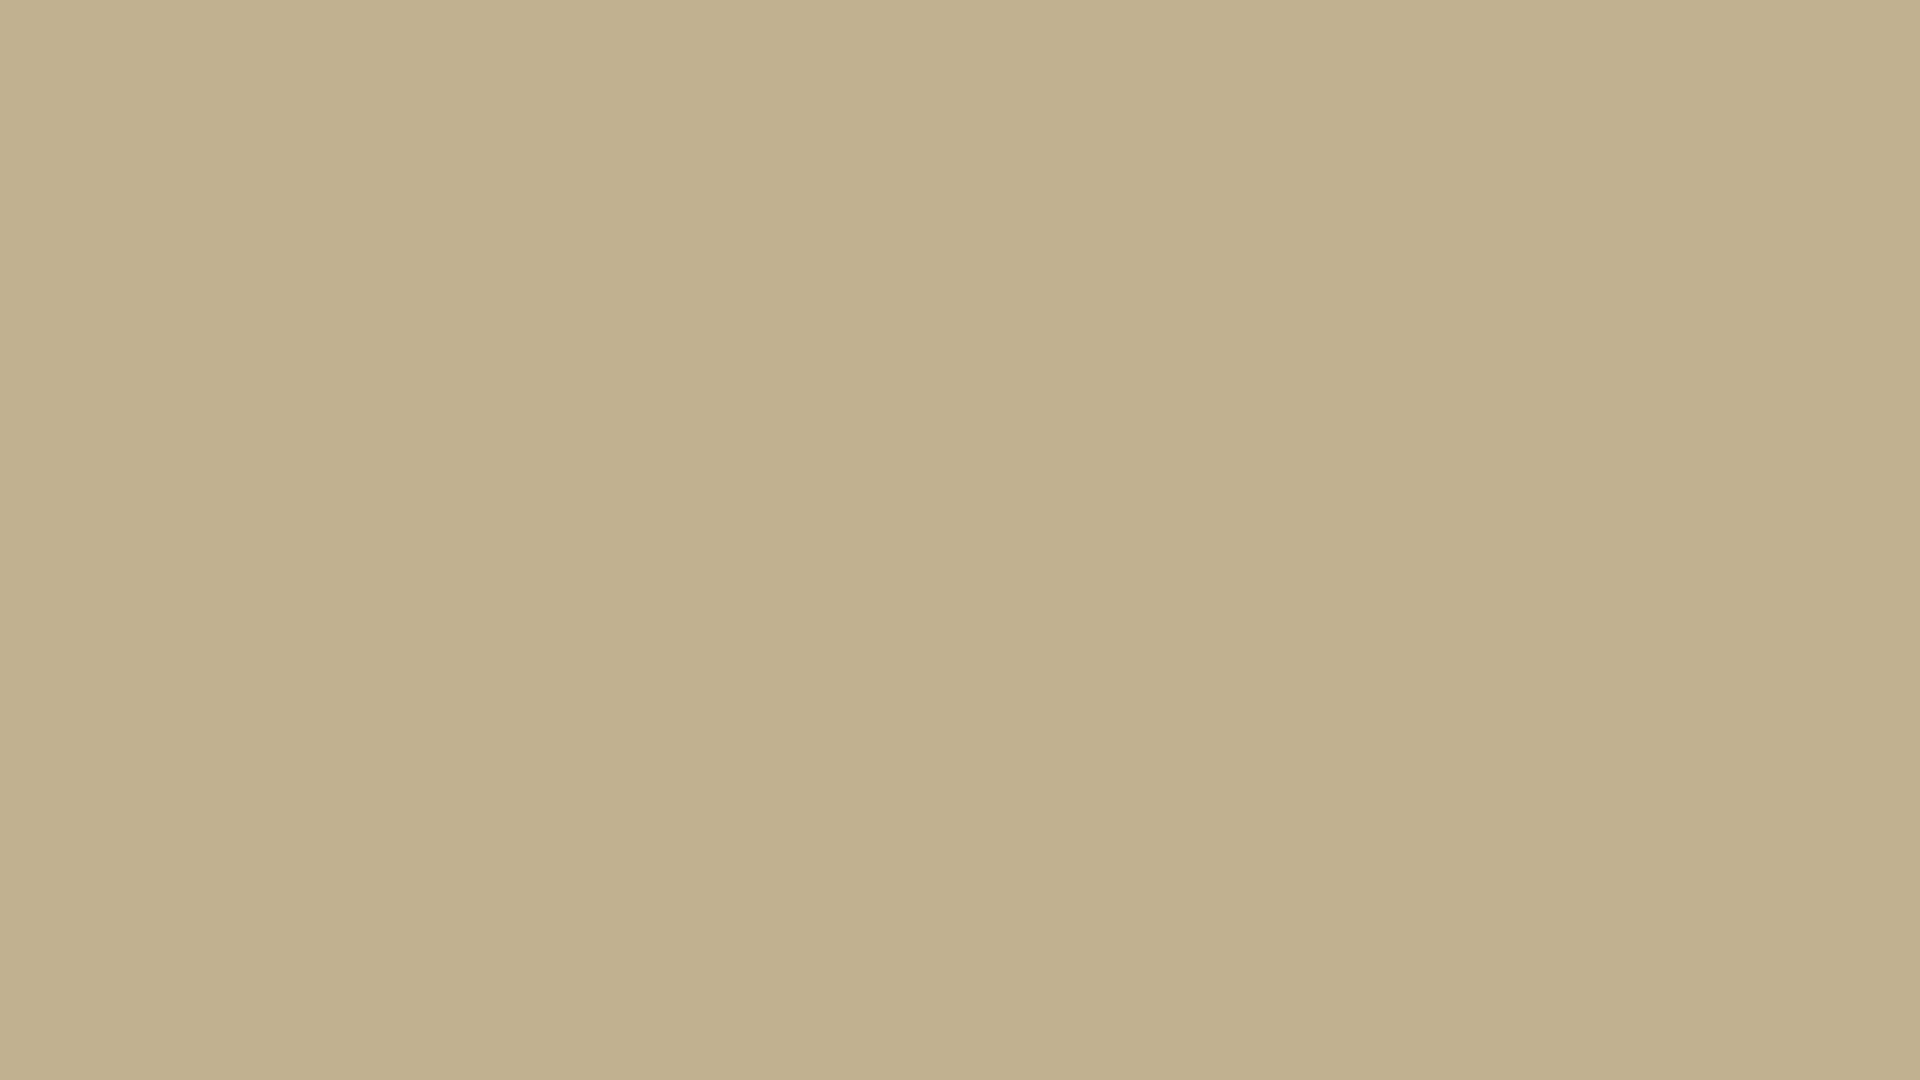 1920x1080 Khaki Web Solid Color Background